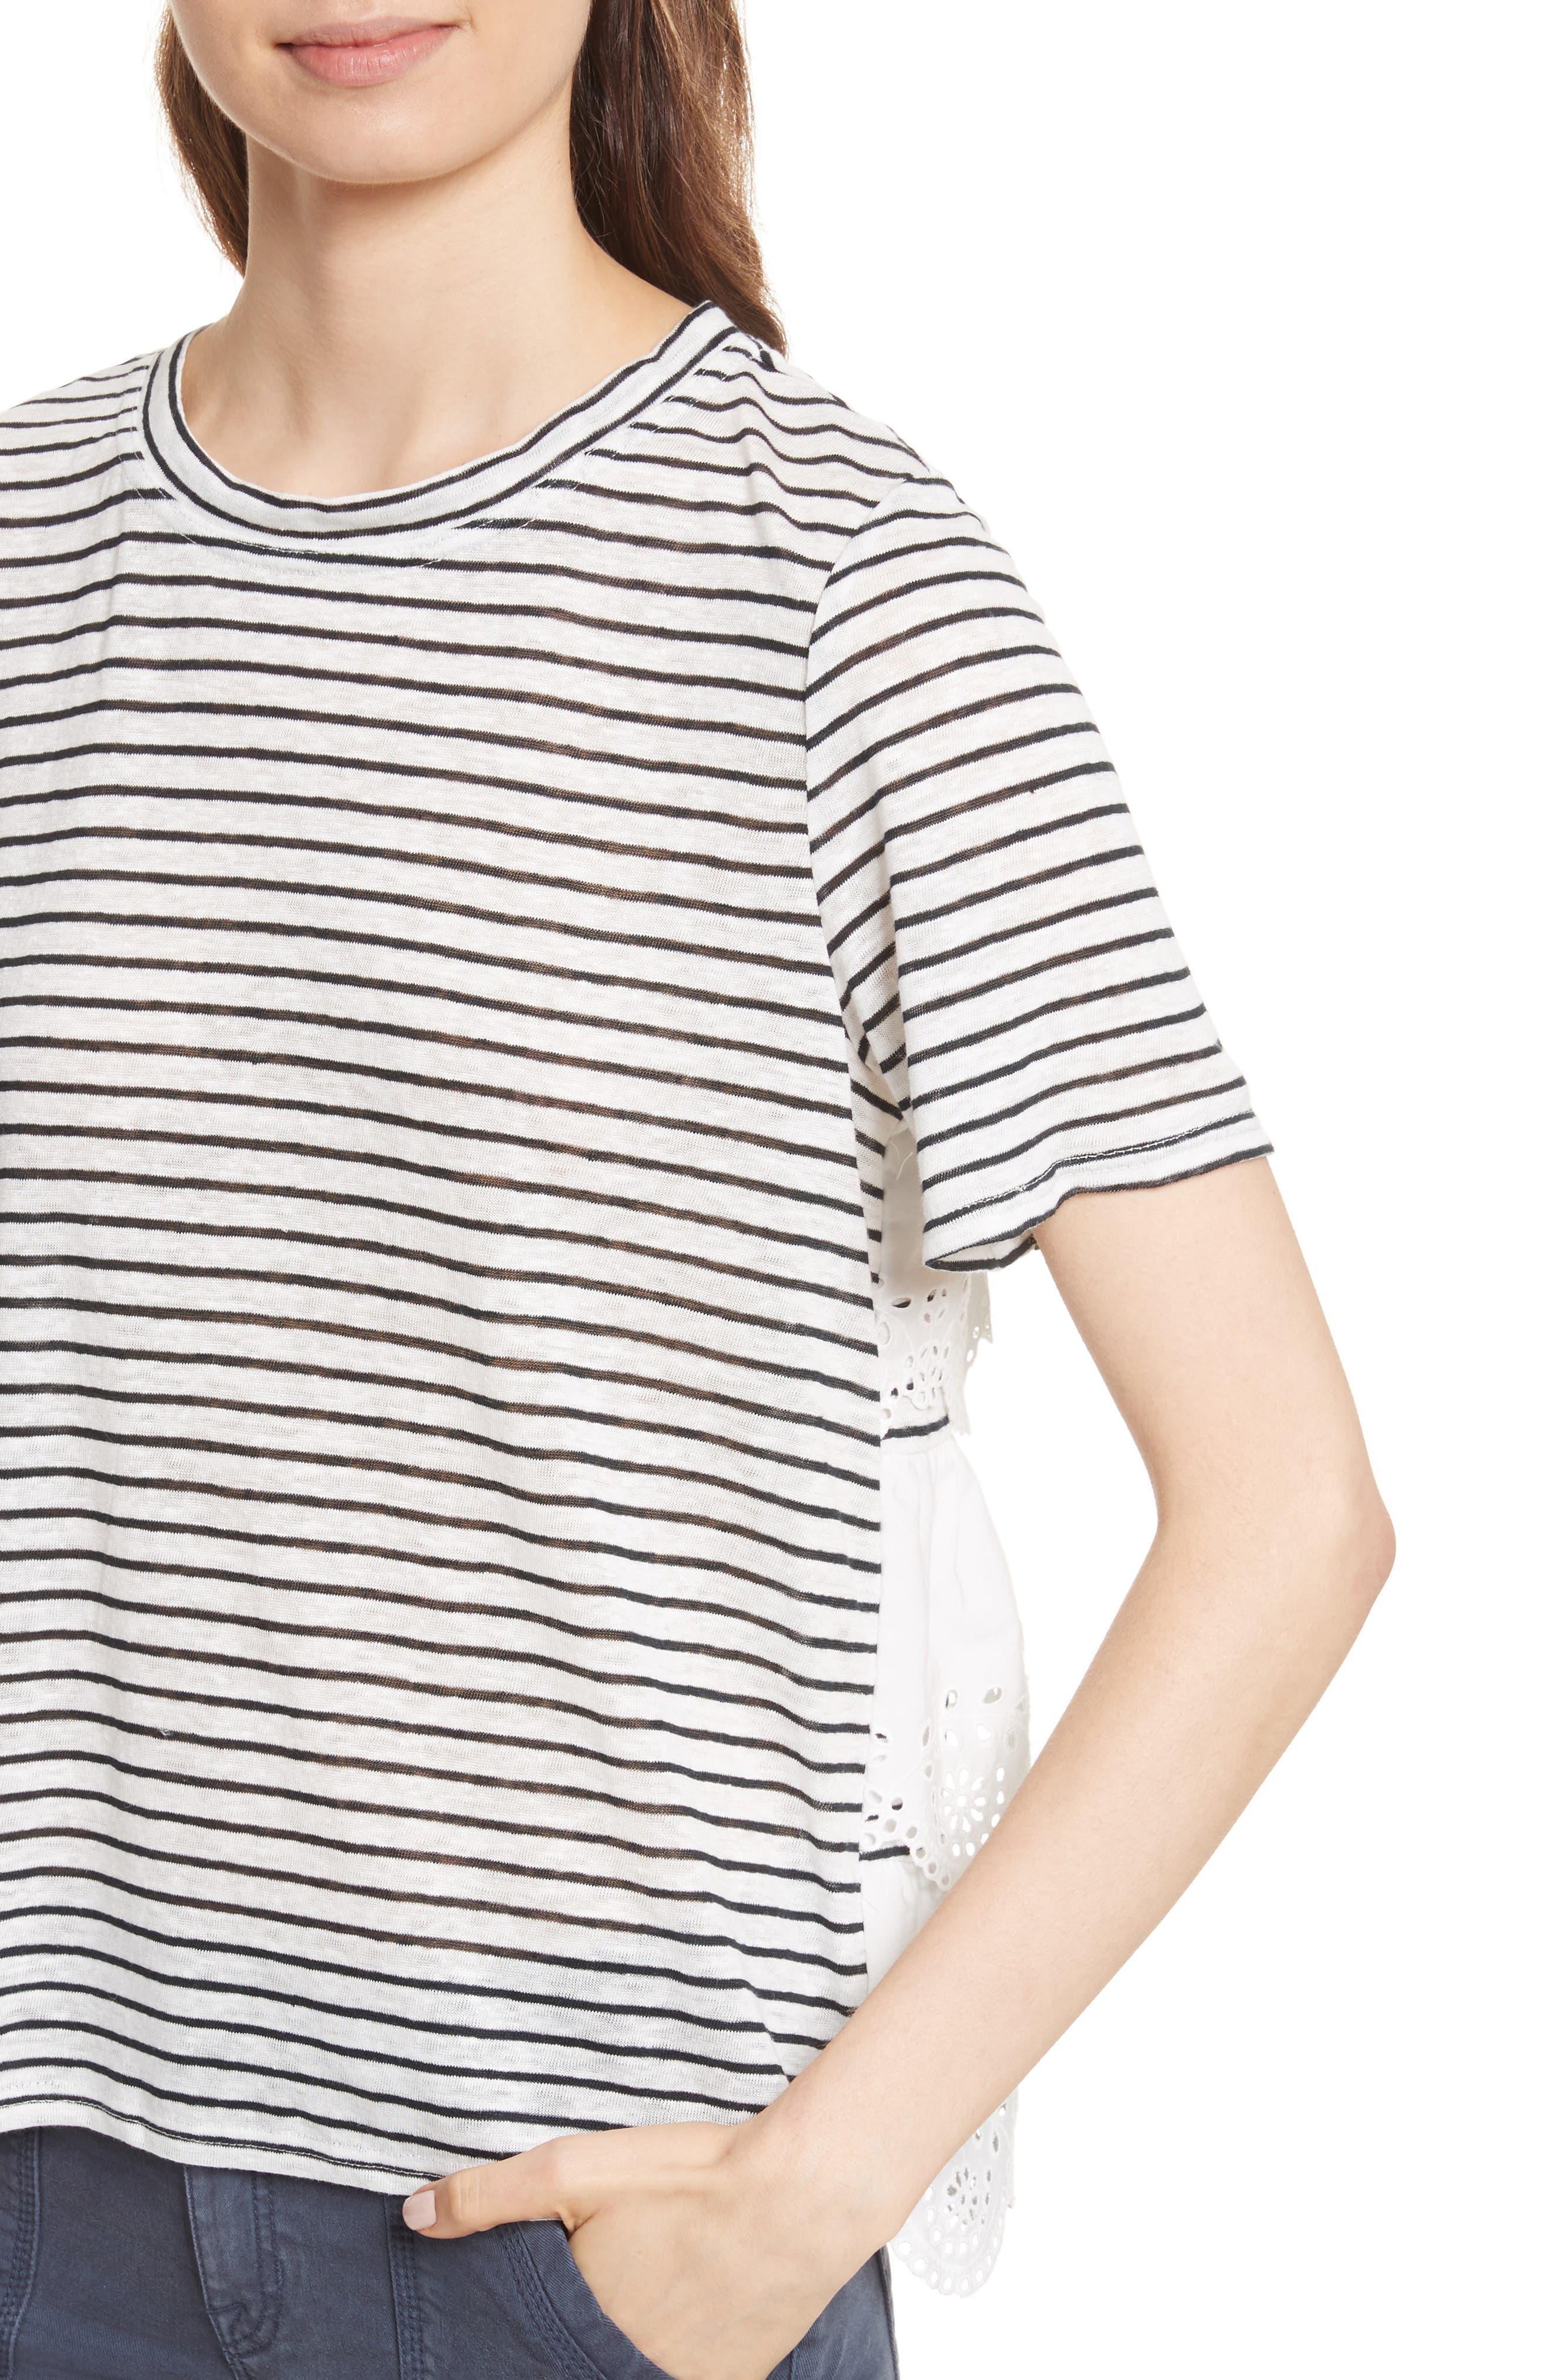 Mikiyo Stripe Linen Tee,                             Alternate thumbnail 4, color,                             131